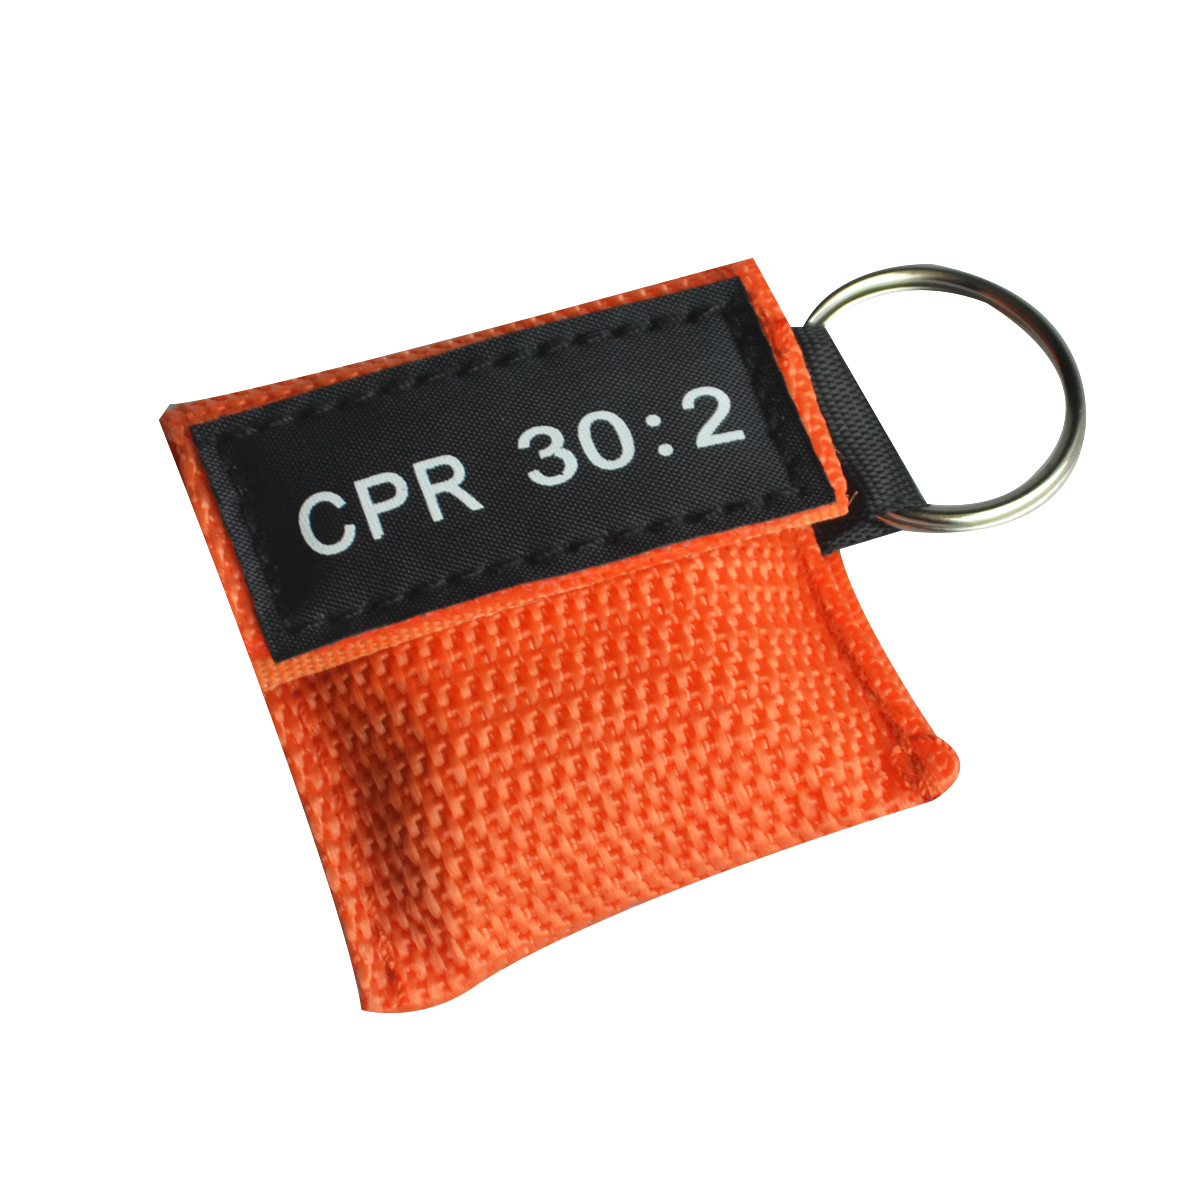 100 pcs CPR หน้ากาก Resuscitator One   way วาล์ว Life Key Skill การฝึกอบรมกระเป๋า Mask Face Guard Health Care Tool สีส้ม-ใน หน้ากาก จาก ความงามและสุขภาพ บน   1